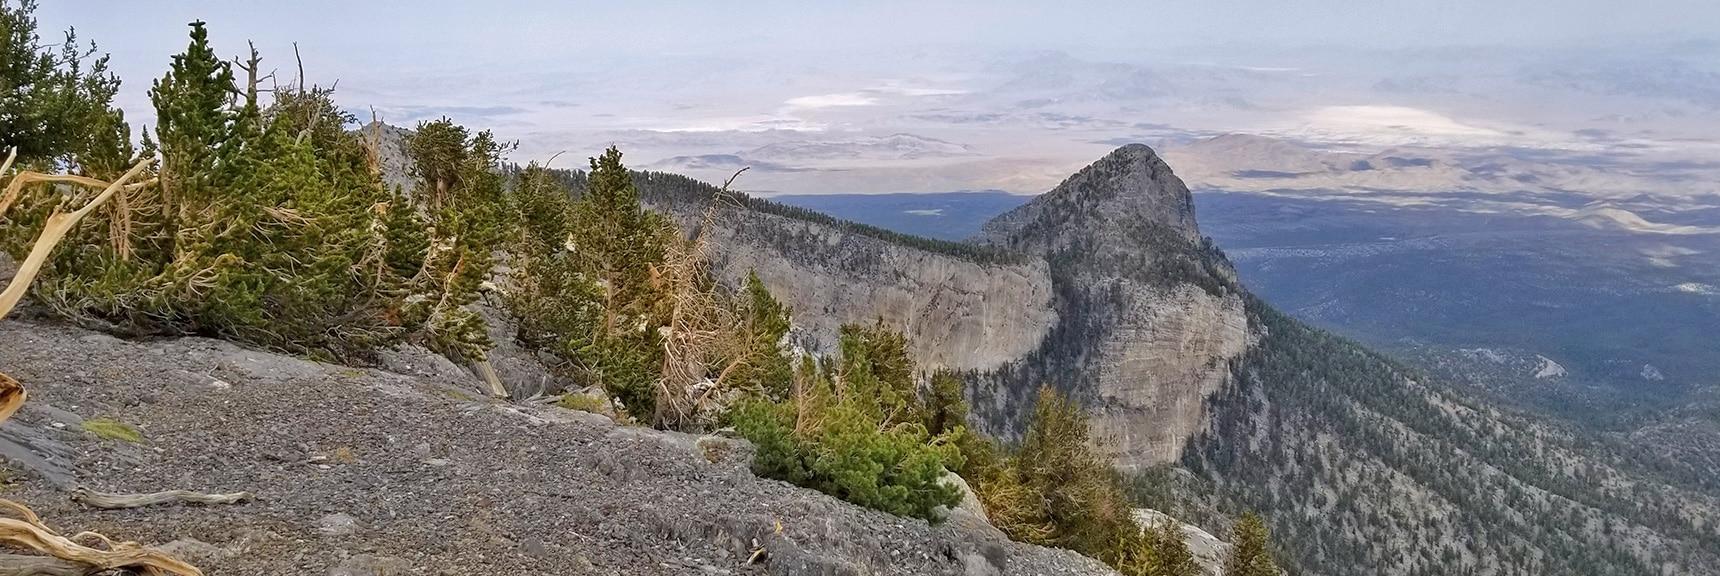 View of Mummy's Head from the Eastern Summit Cliffs   Mummy Mountain Northern Rim Overlook, Spring Mountain Wilderness, Nevada